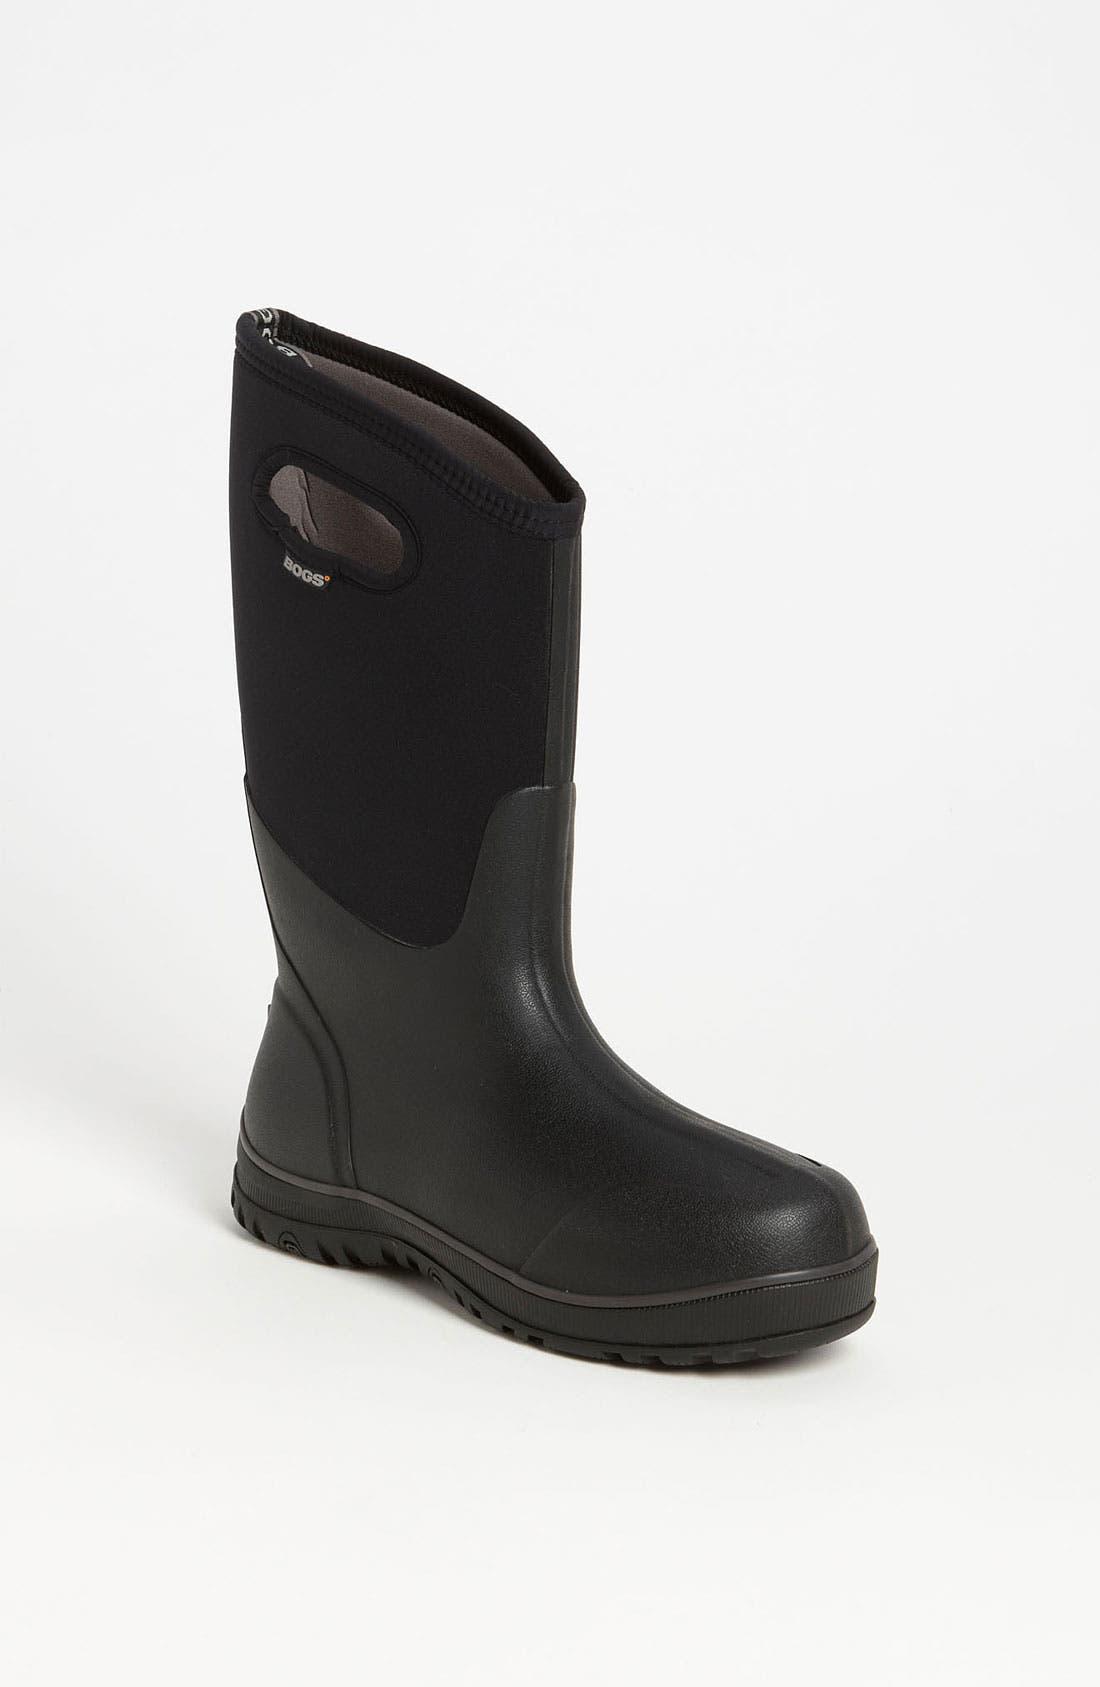 Alternate Image 1 Selected - Bogs 'Ultra High' Rain Boot   (Online Only) (Men)